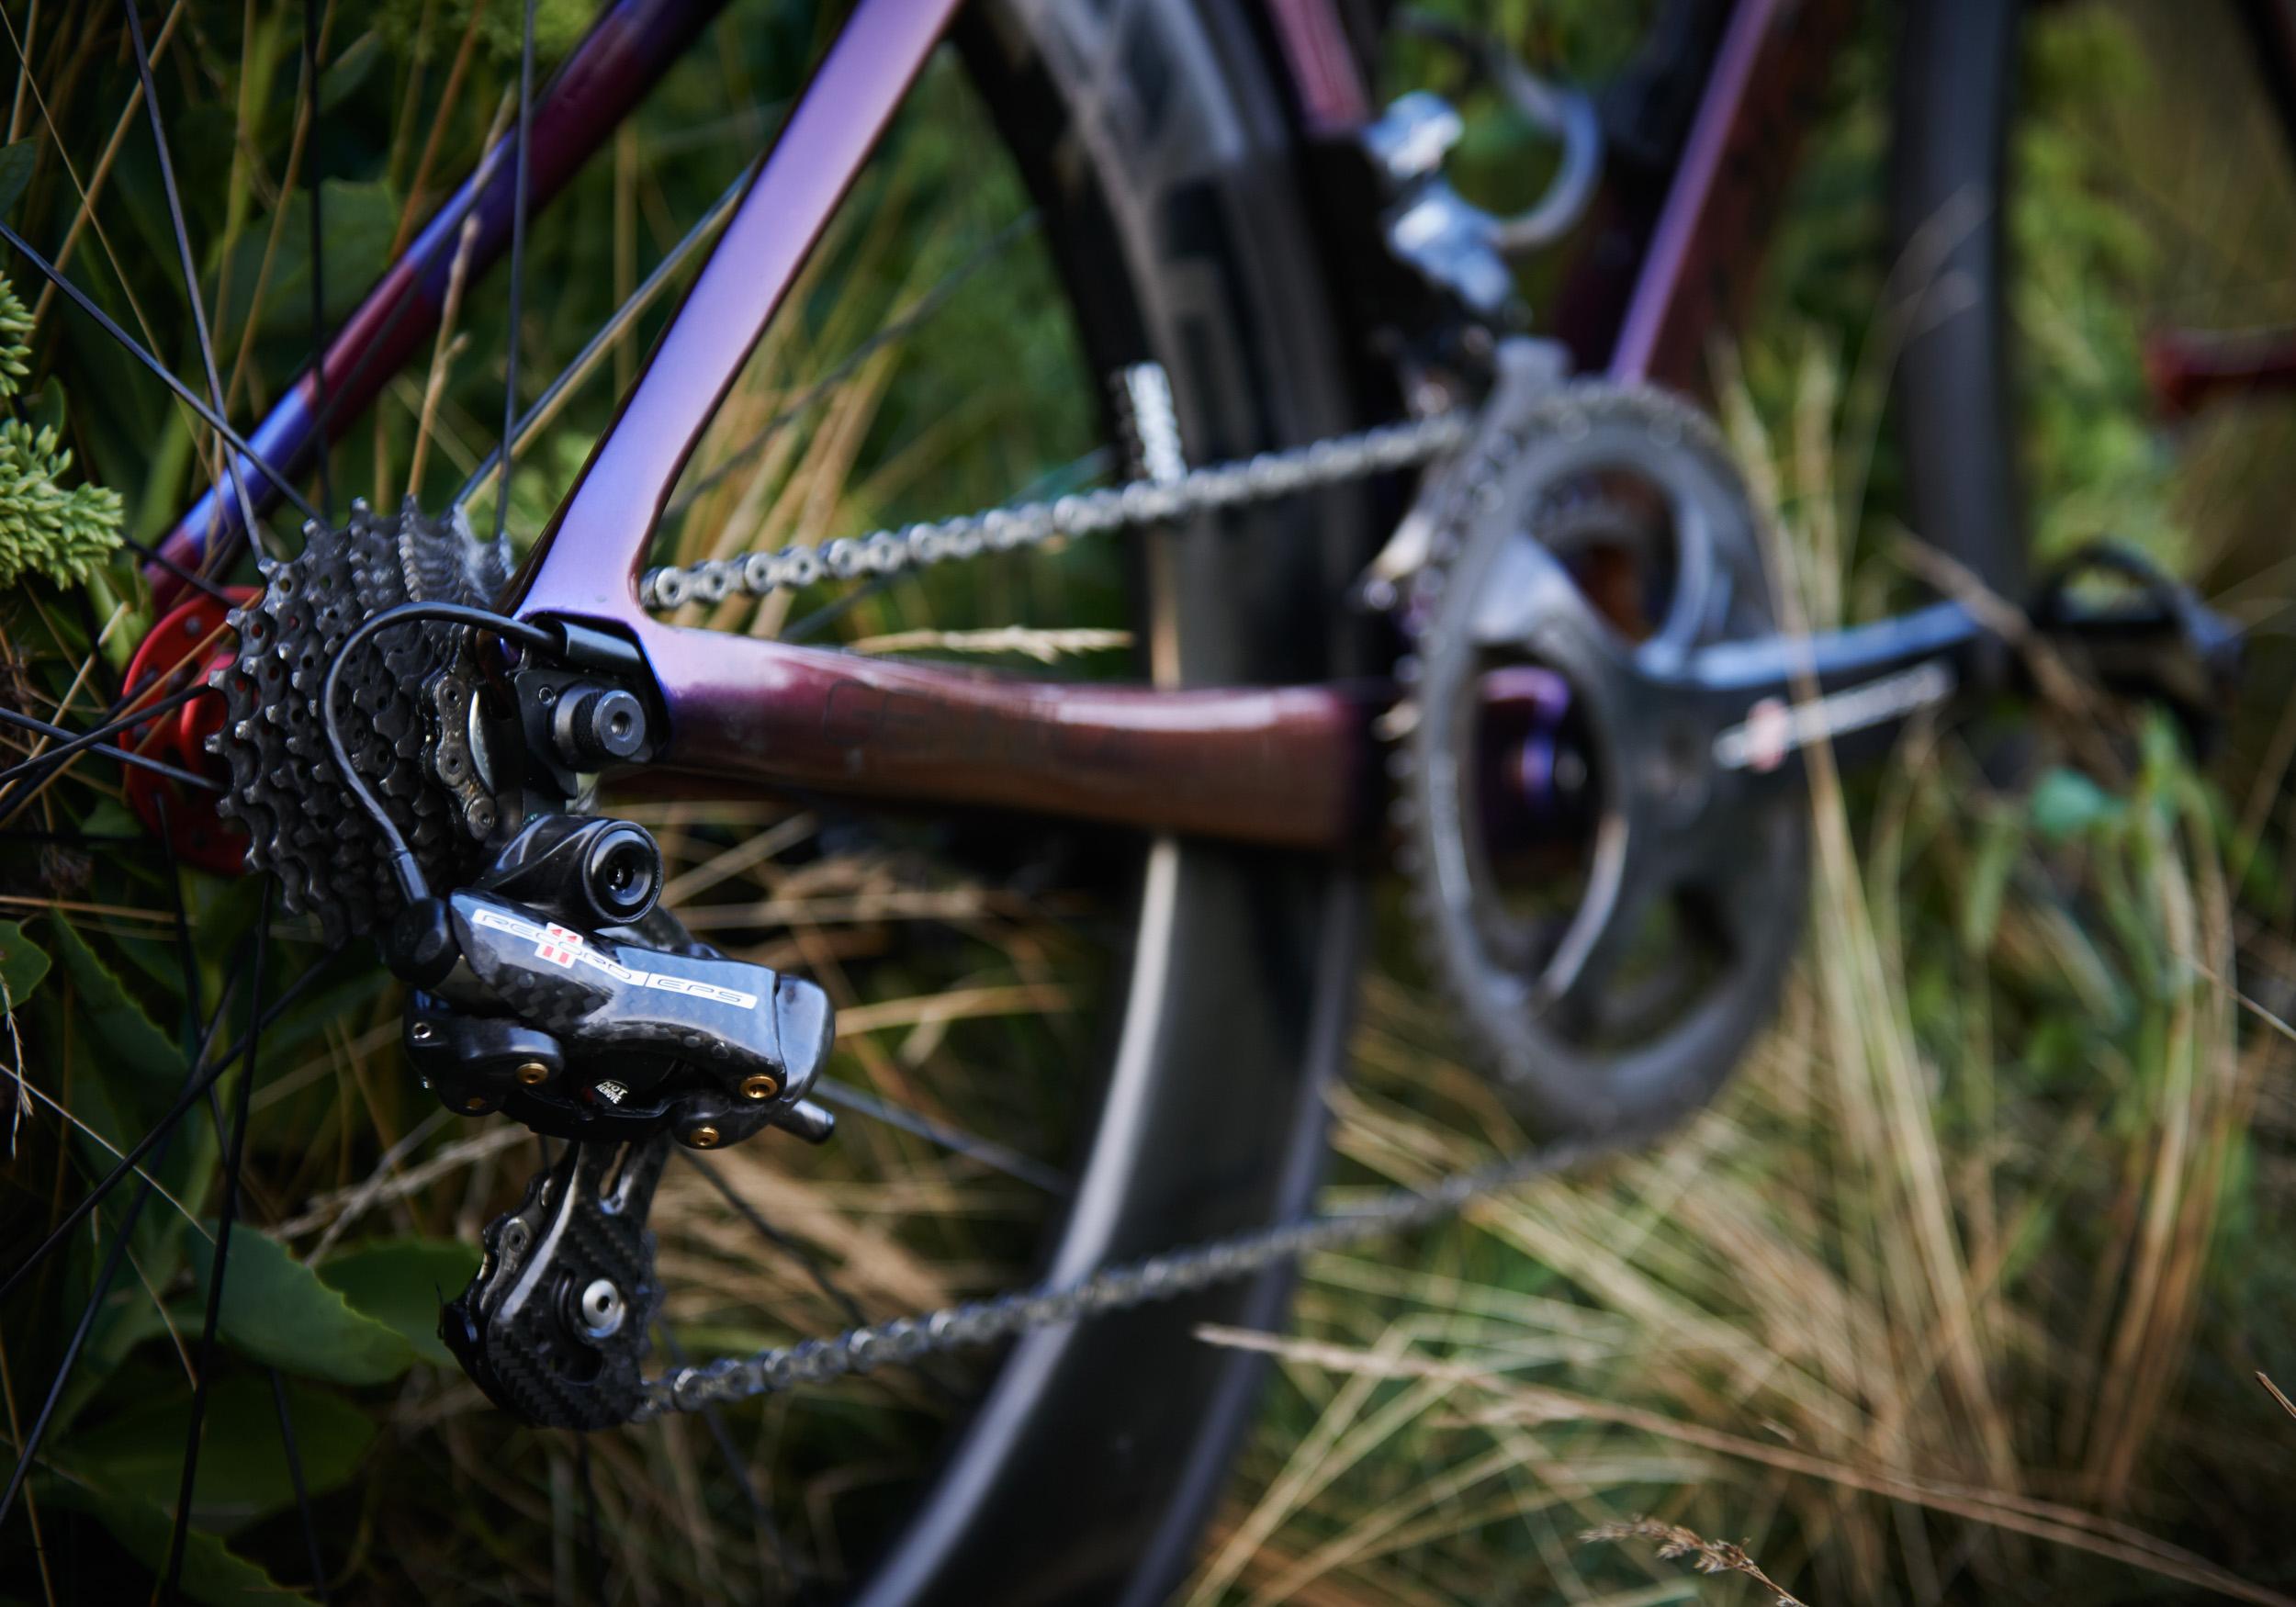 to-be-determined-garneau-a1-bike-review-105.jpg